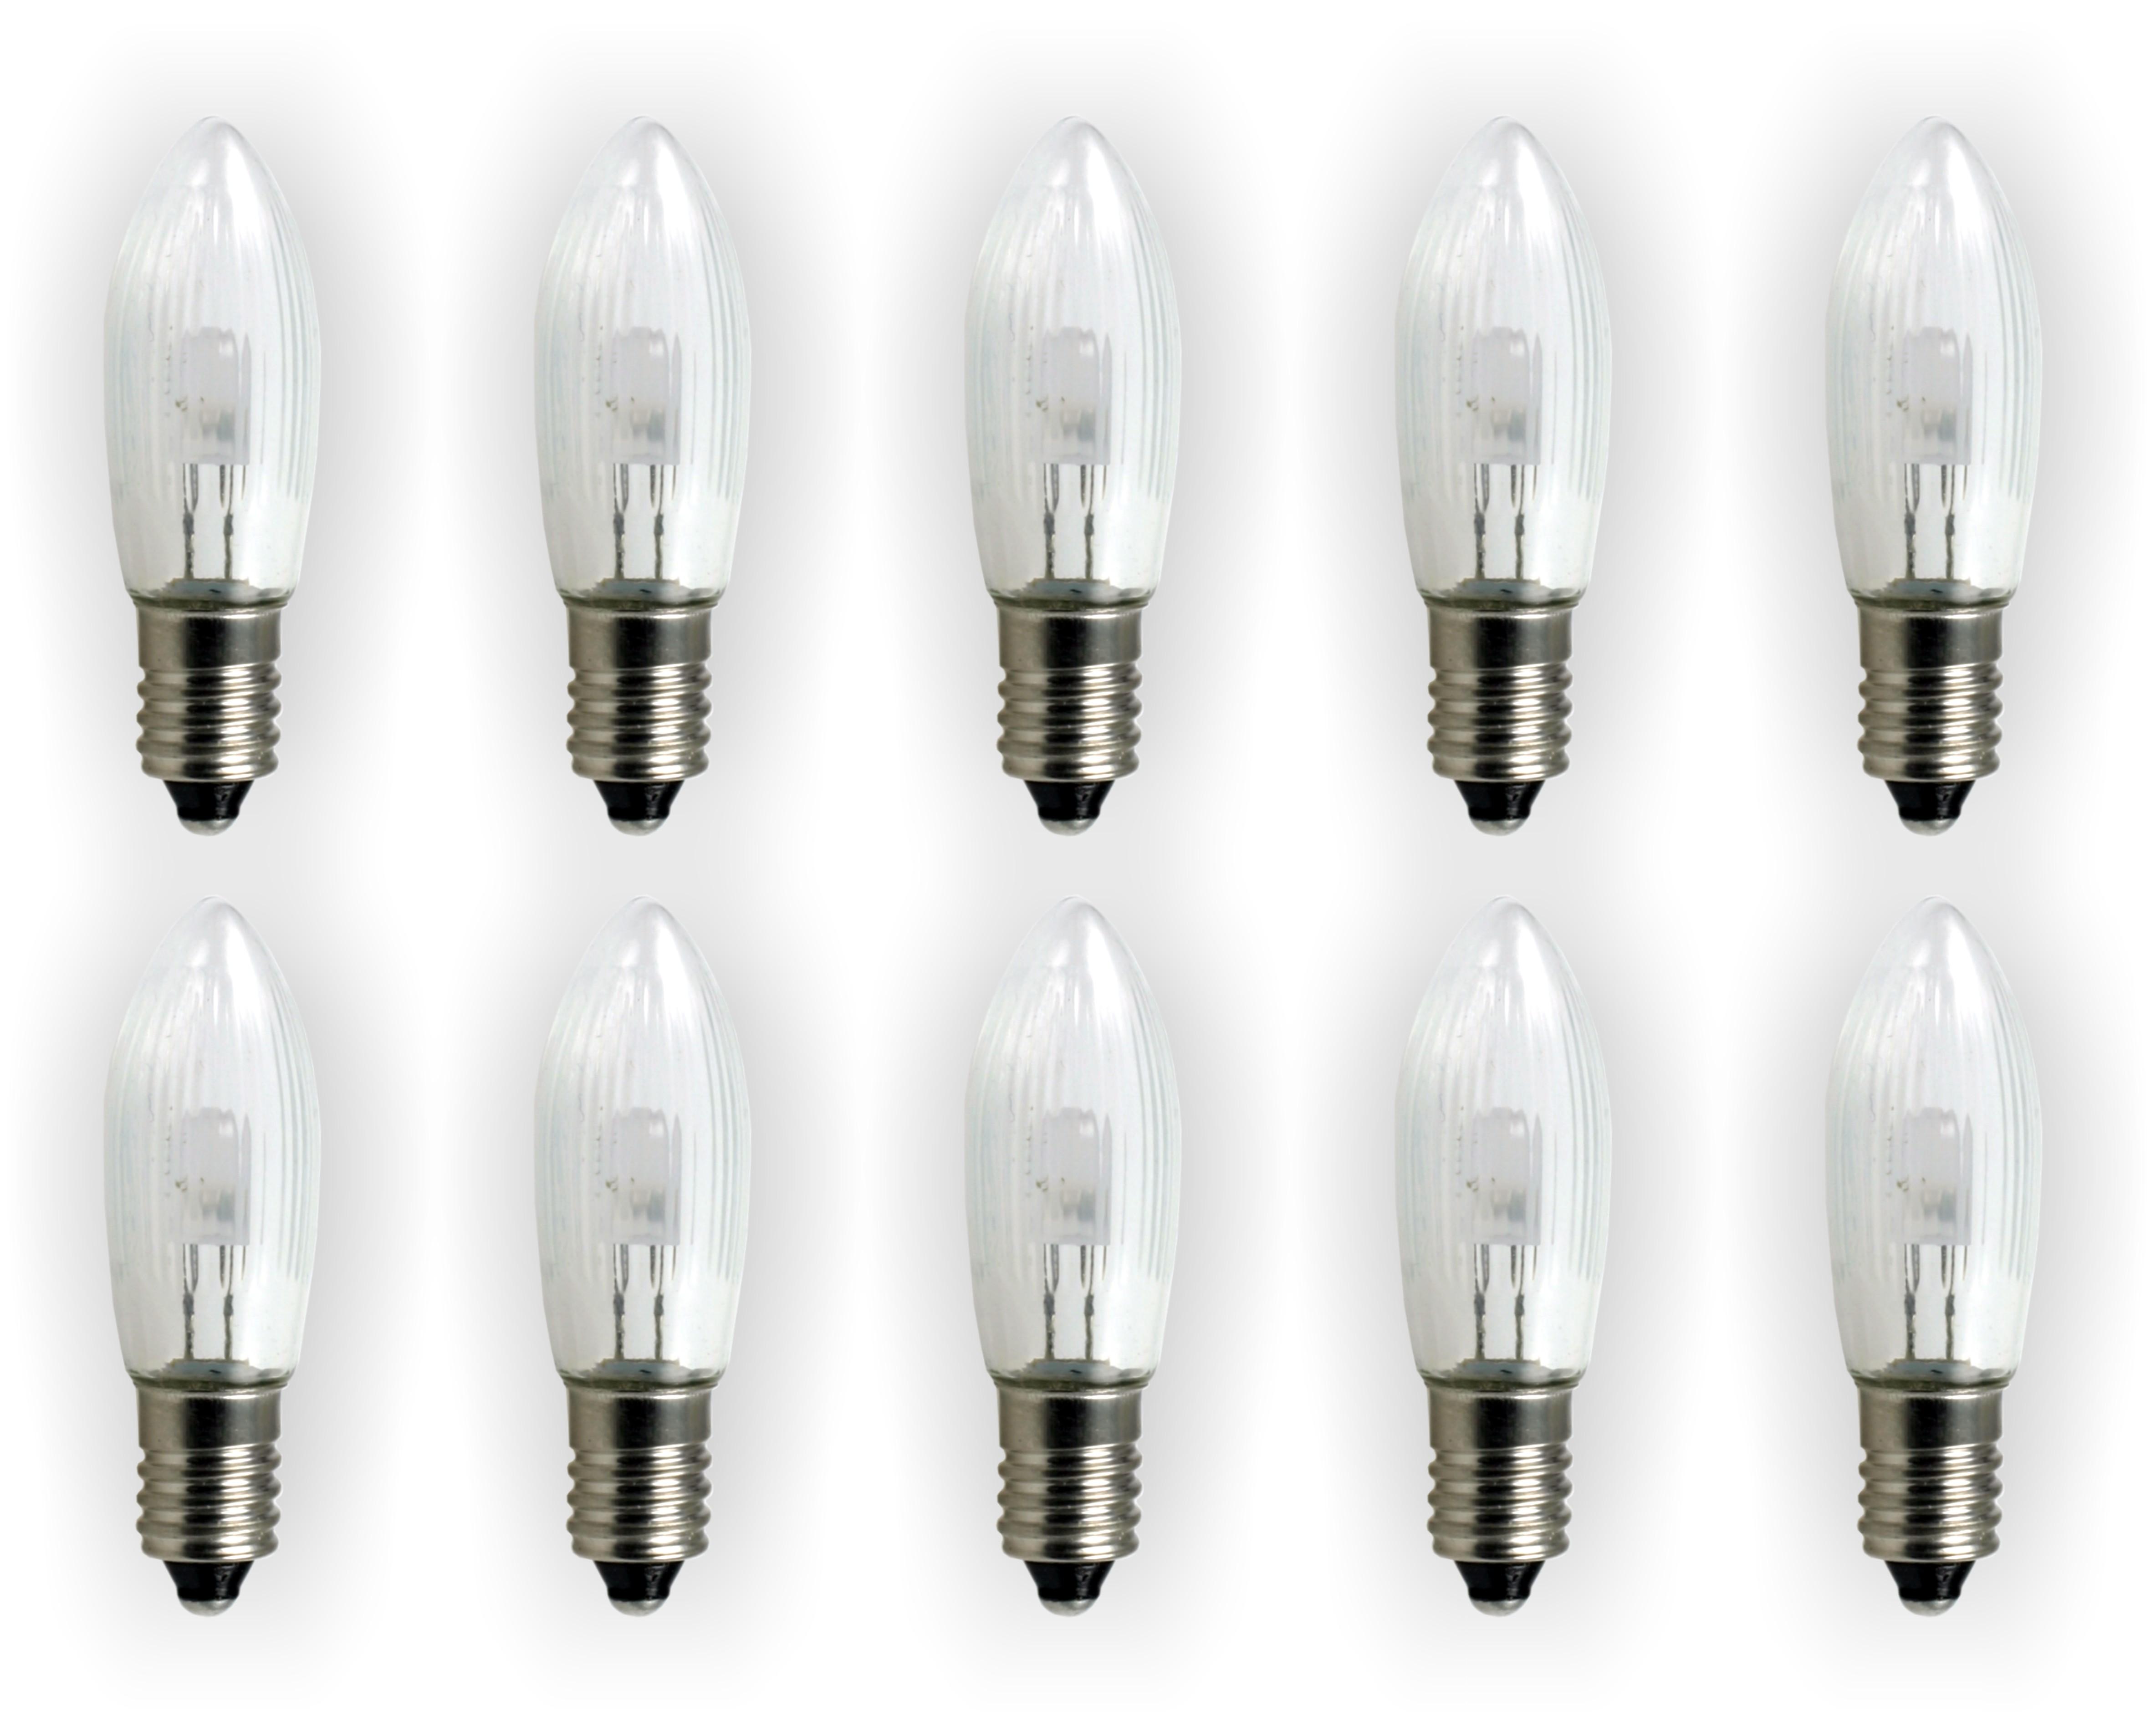 10 st ck e10 led ersatzlampen gl hbirnen topkerze f r lichterkette lichterbogen ebay. Black Bedroom Furniture Sets. Home Design Ideas